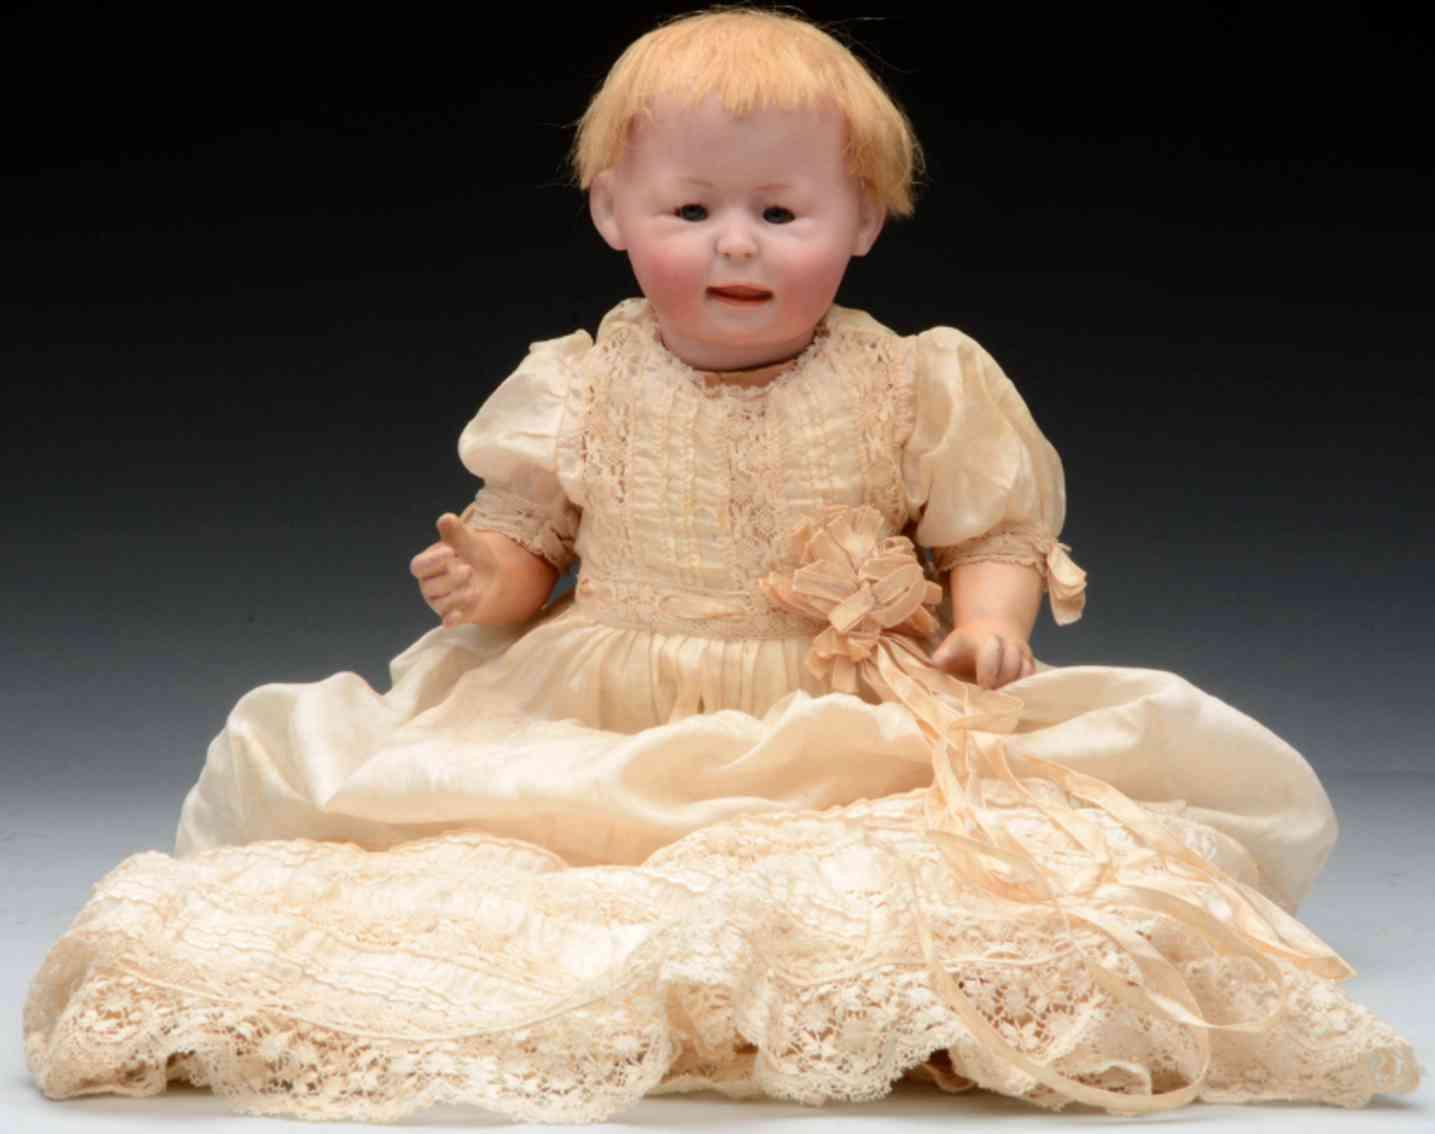 simon & halbig 1428 46 perfect german bisque socket head character baby doll